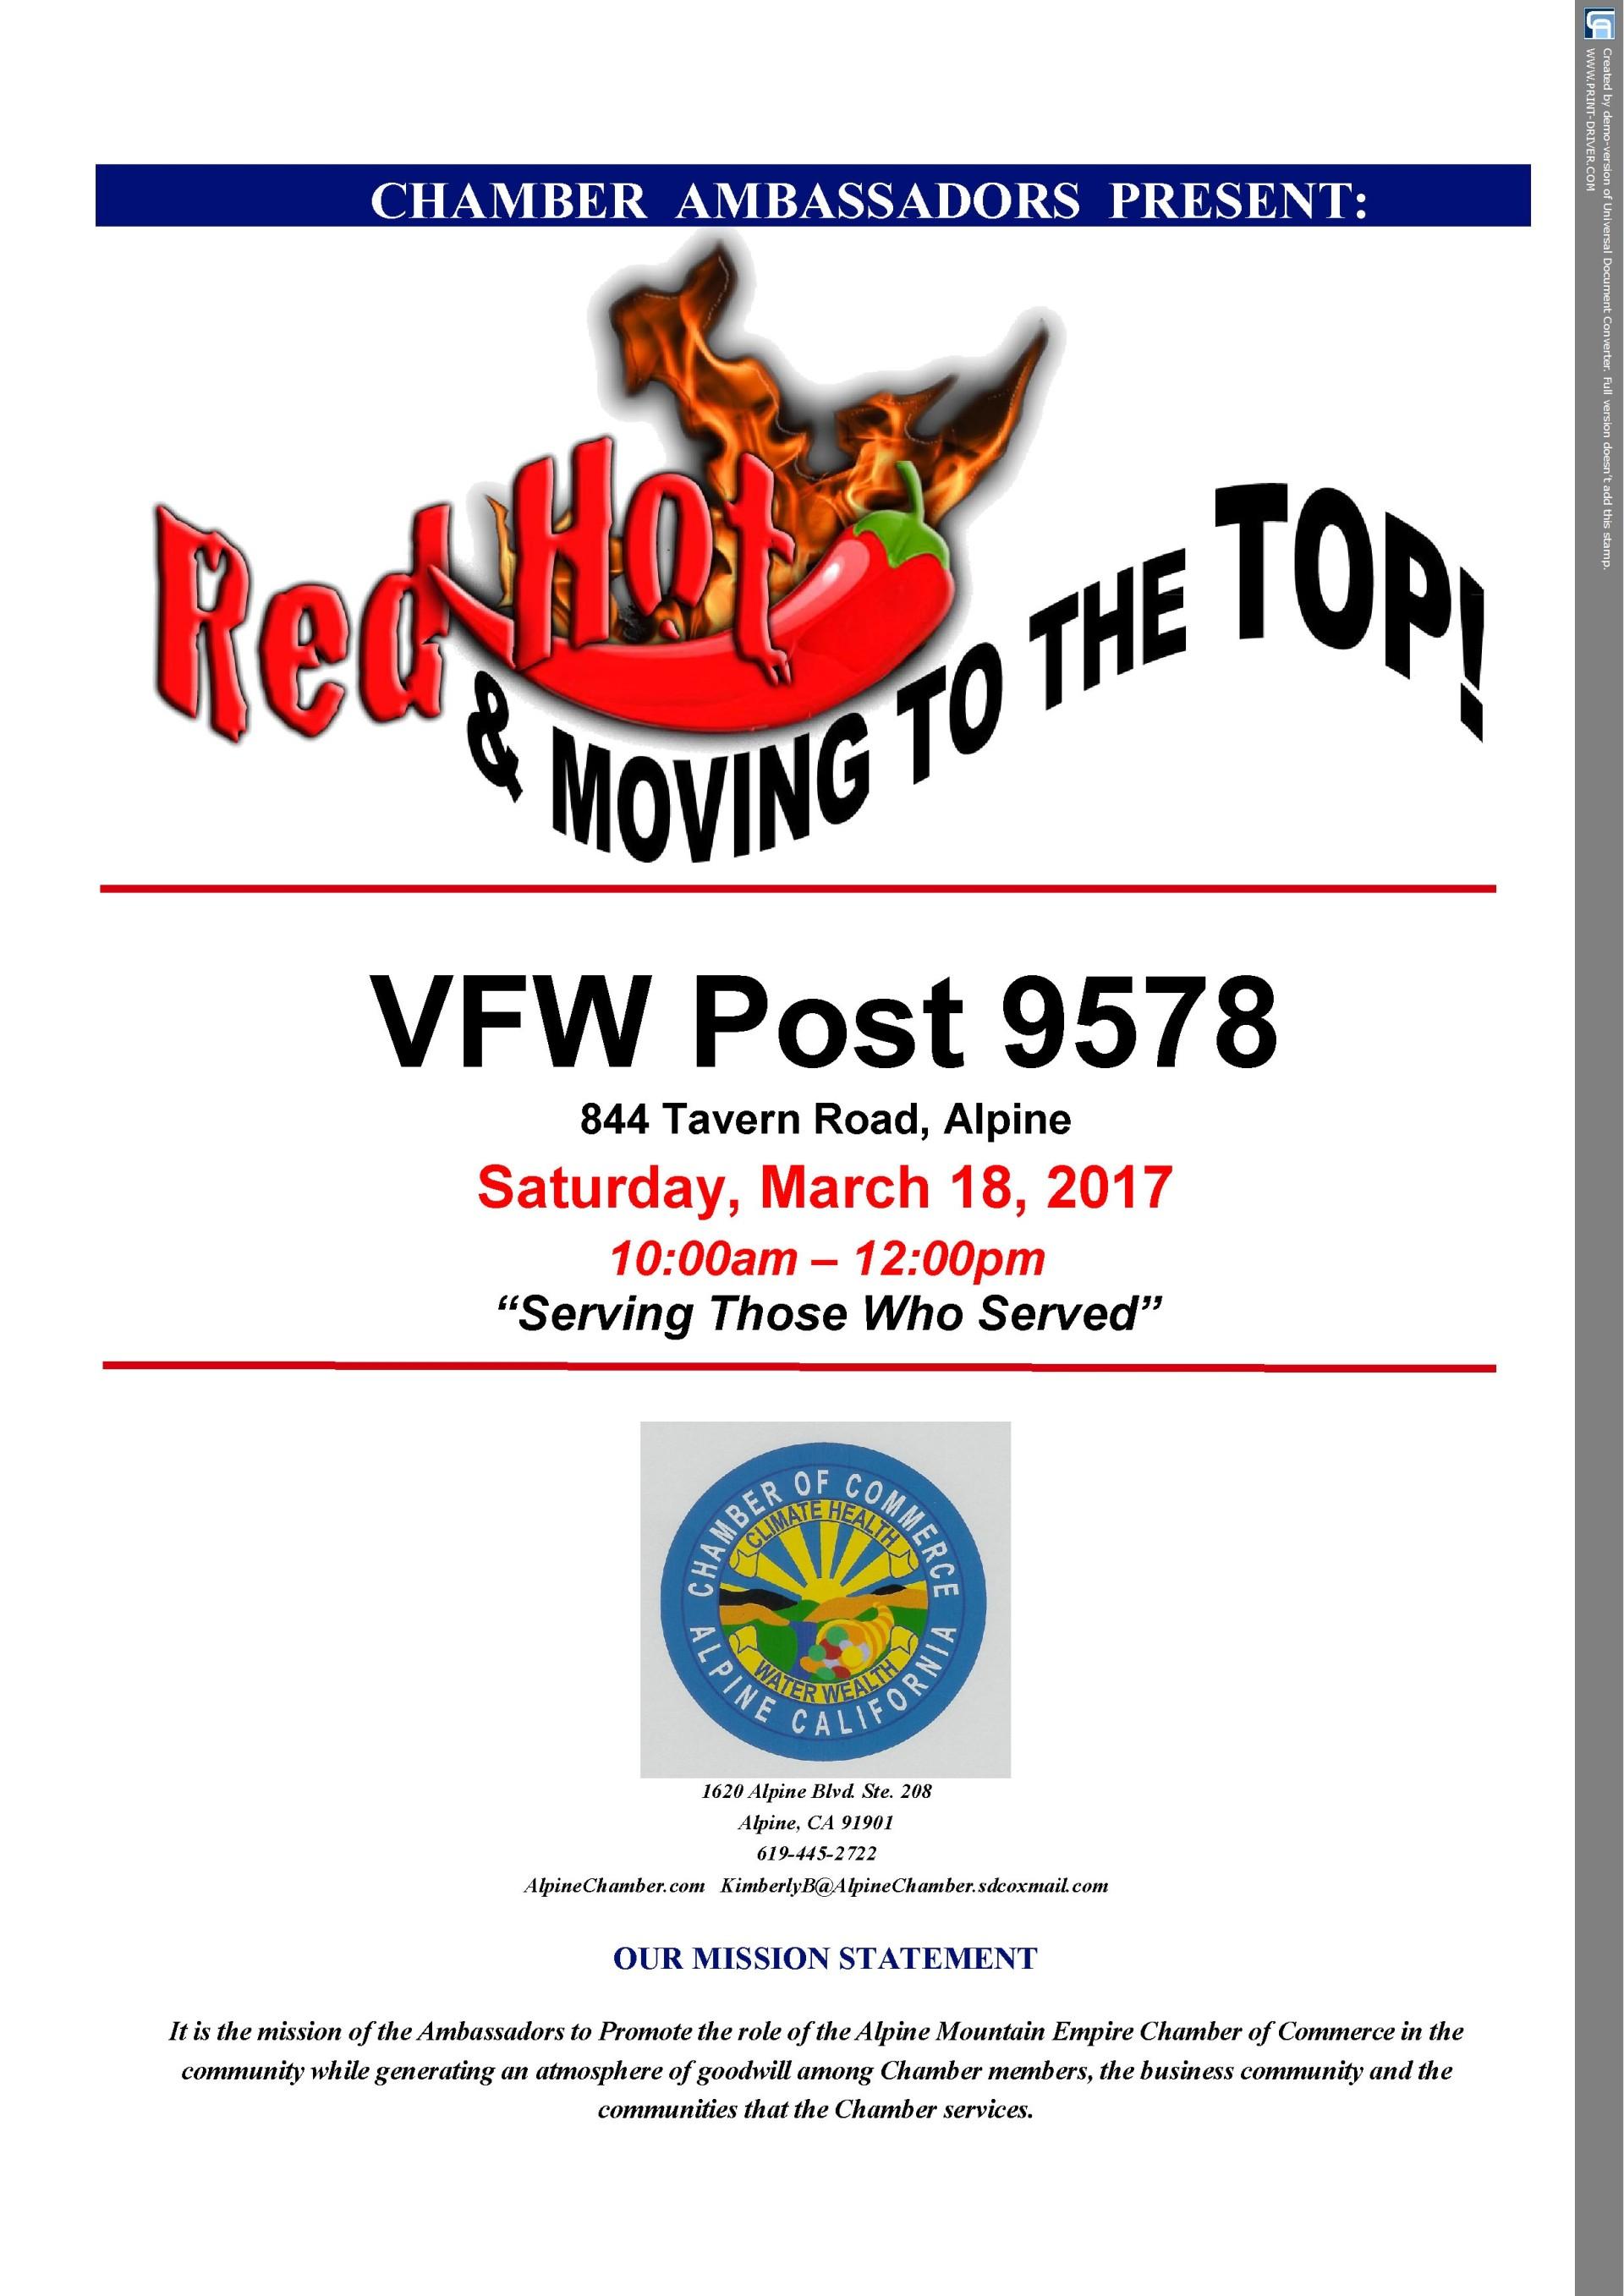 Red-Hot-Mar.-18-at-VFW(1)(1)-w1920.jpg